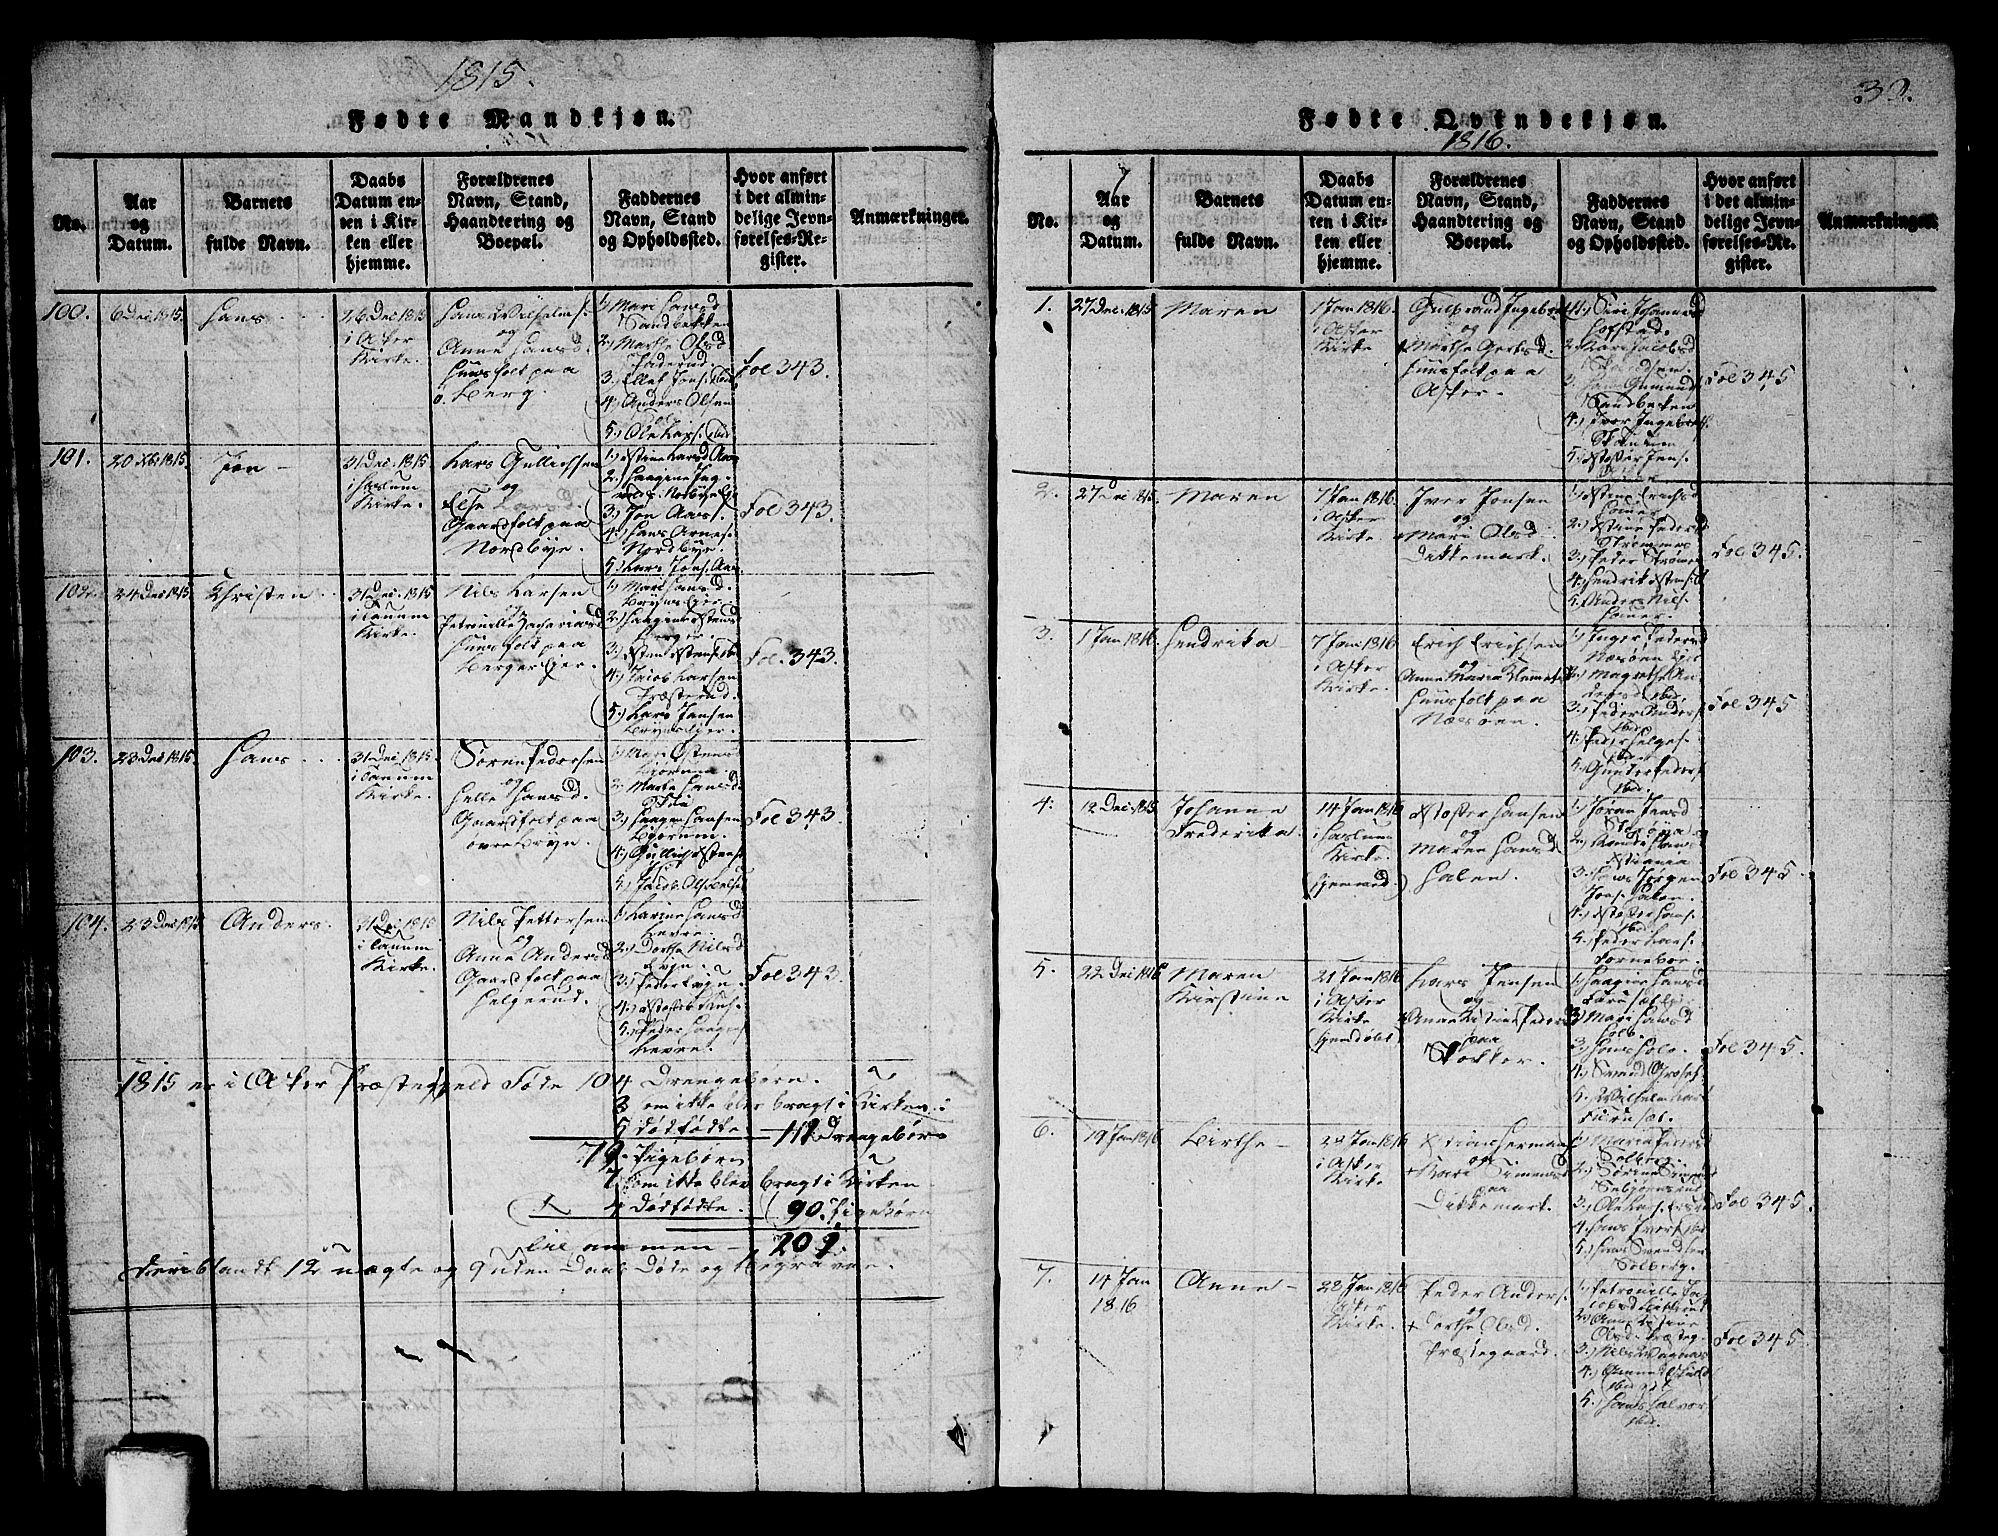 SAO, Asker prestekontor Kirkebøker, G/Ga/L0001: Klokkerbok nr. I 1, 1814-1830, s. 30